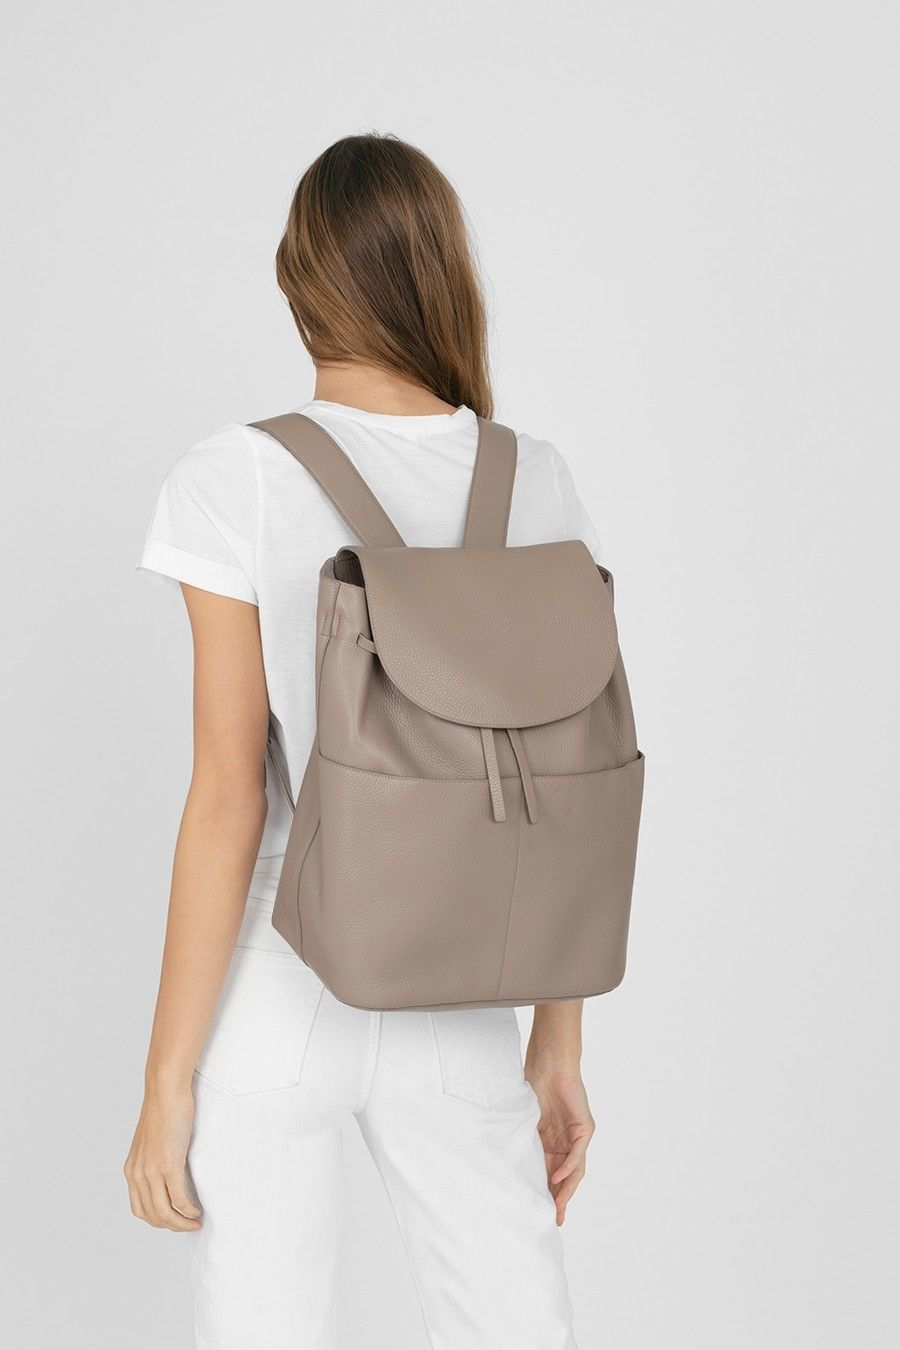 55eb6466e3 Large Leather Backpack